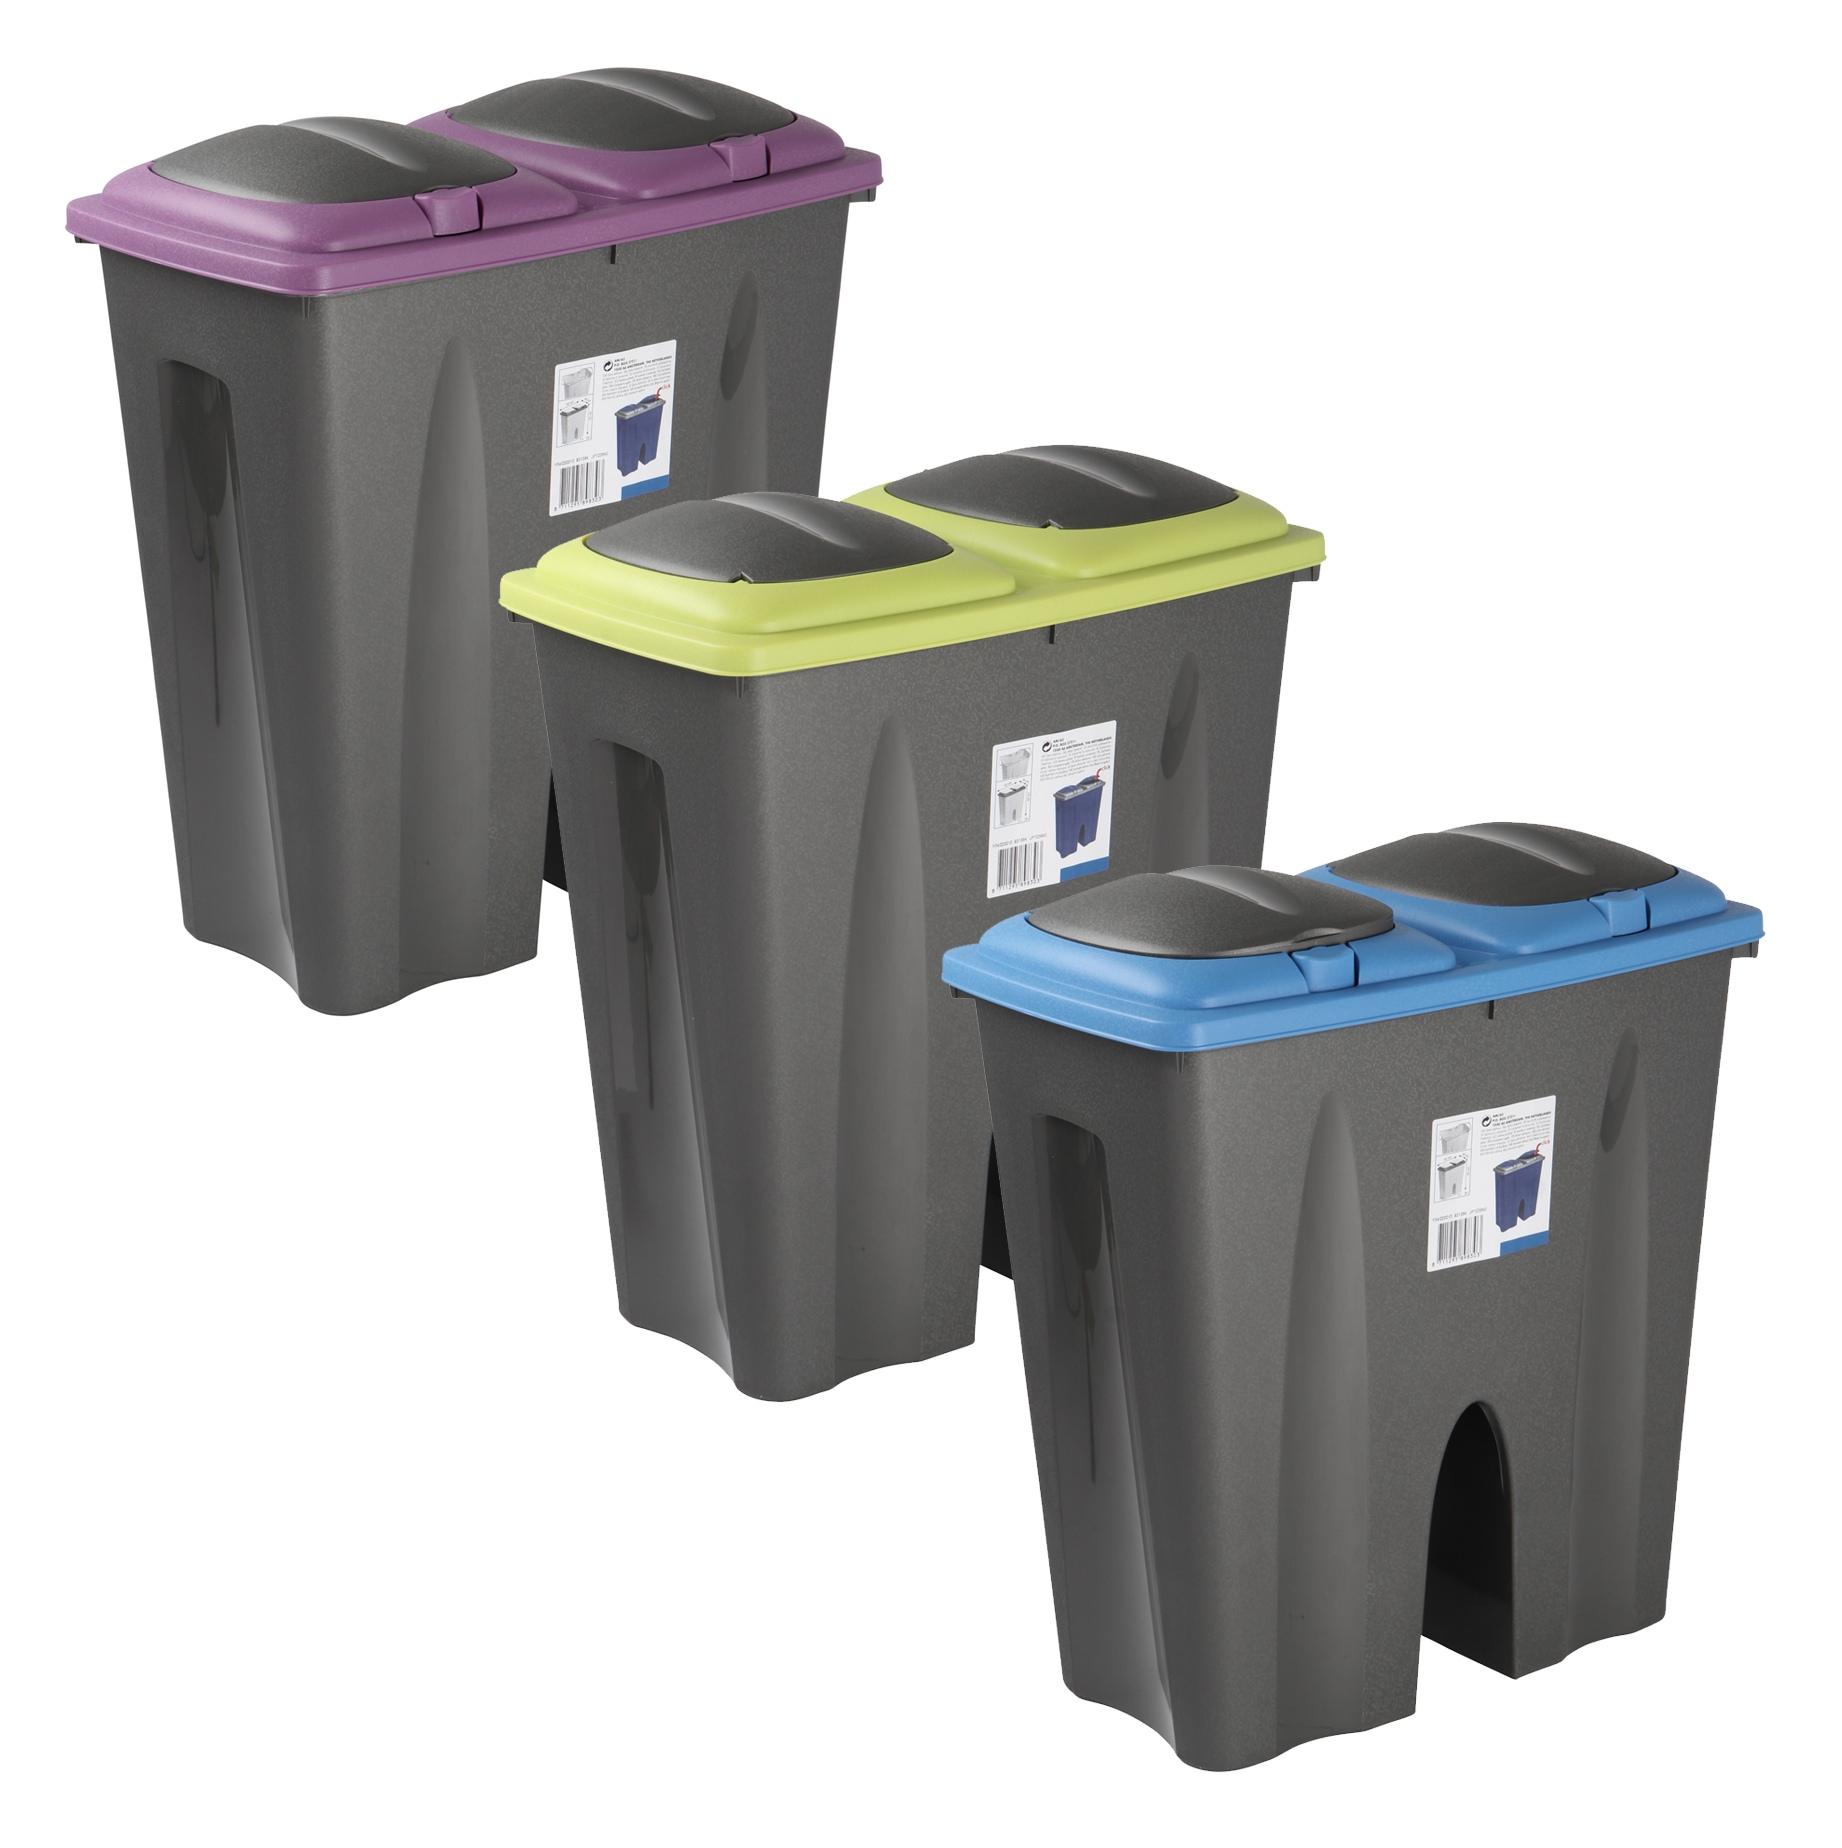 double recycling waste bin duo rubbish plastic cardboard disposal 2 x 25 litre. Black Bedroom Furniture Sets. Home Design Ideas